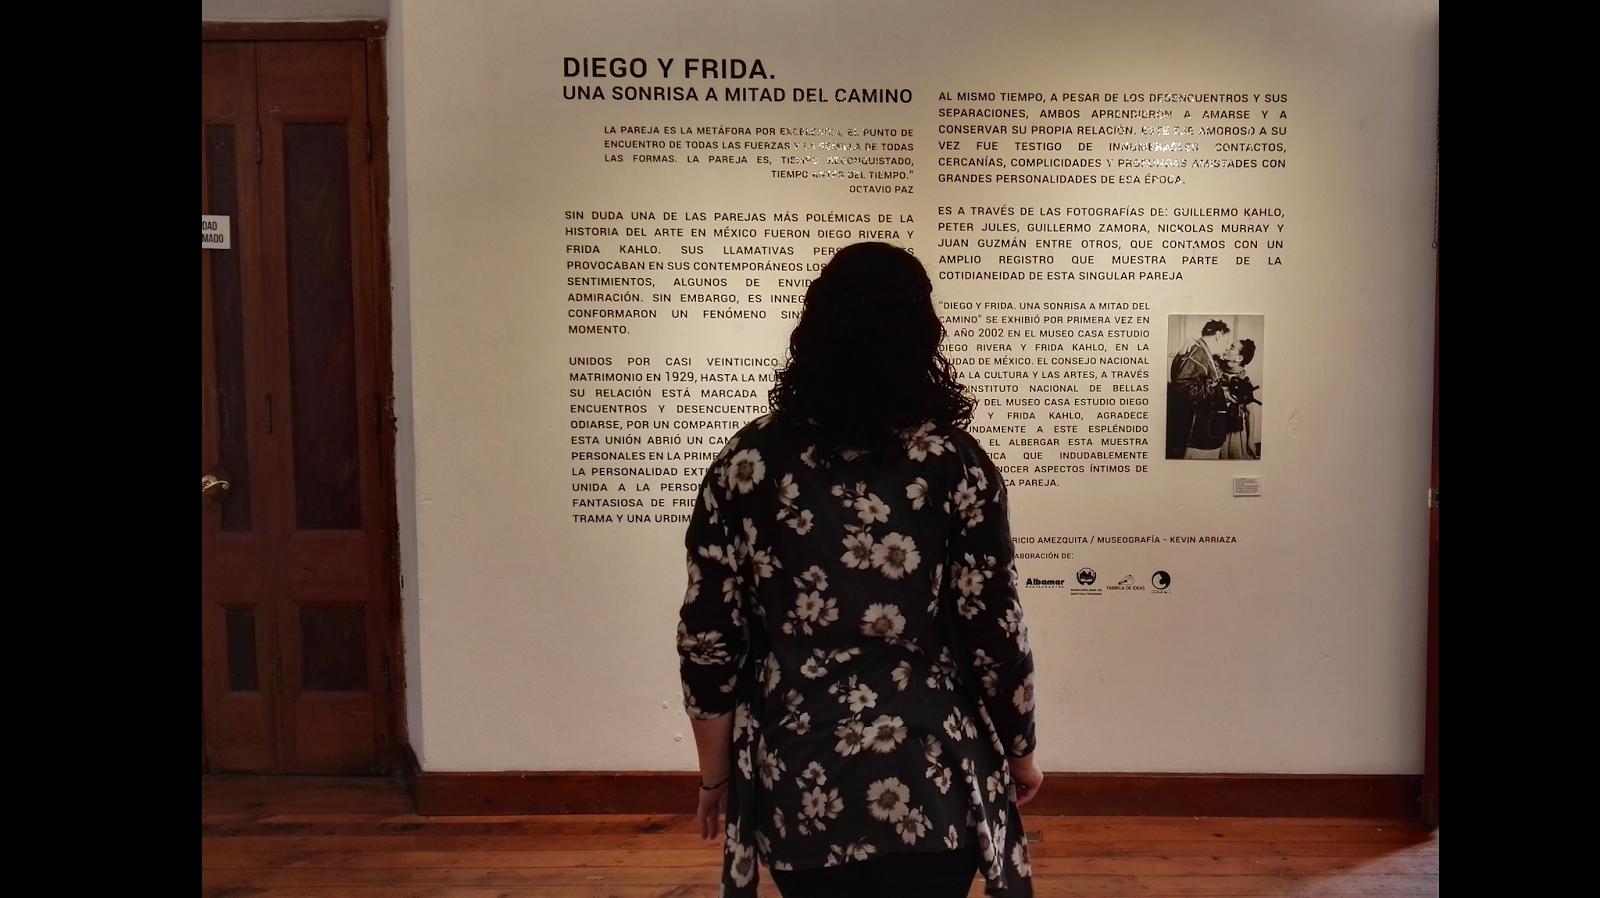 Típico te pasa: Diego, Frida y yo